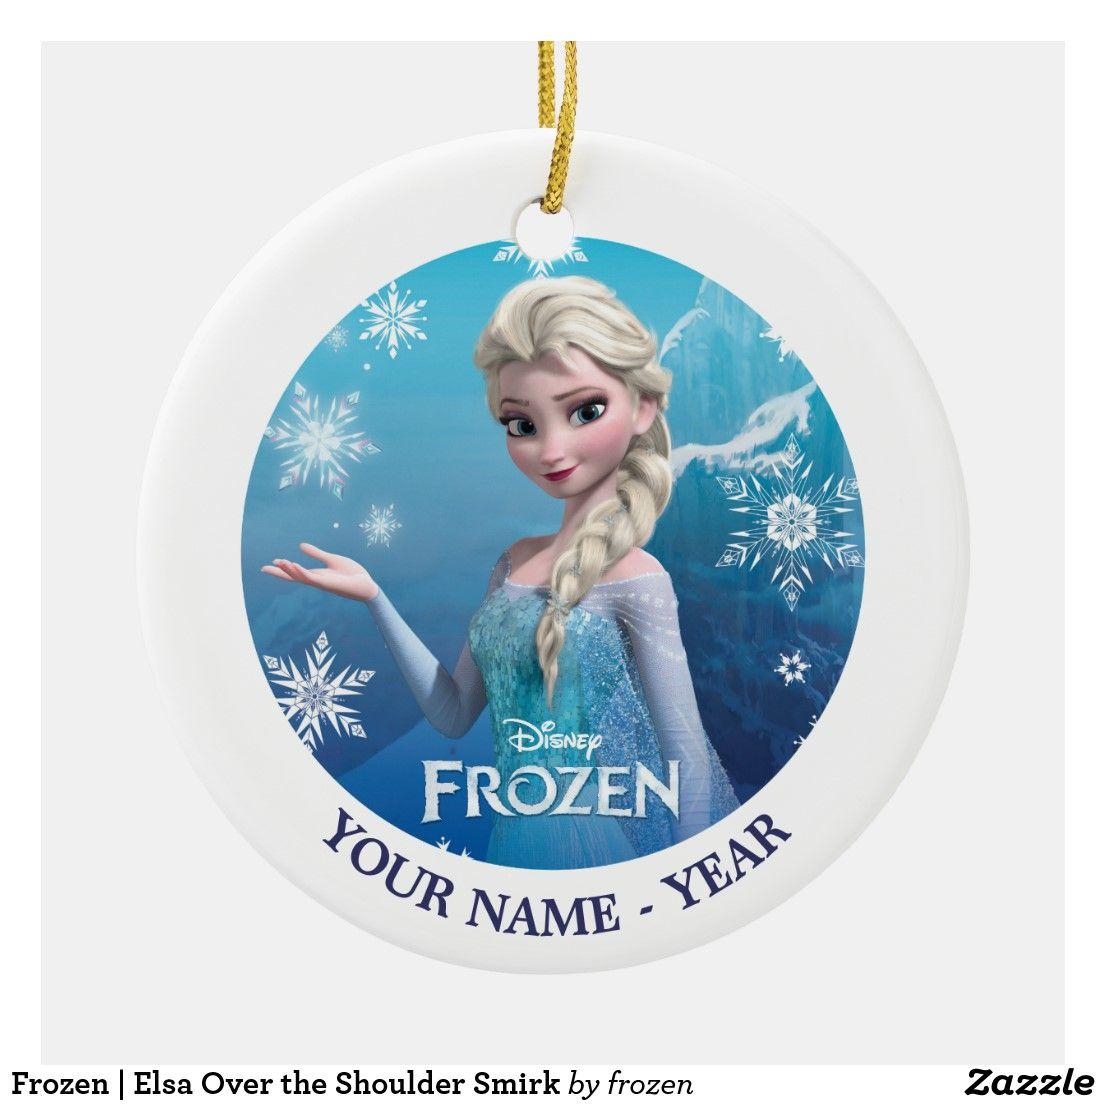 Frozen Elsa Over The Shoulder Smirk Ceramic Ornament Zazzle Com Frozen Ornaments Elsa Frozen Disney Silhouettes